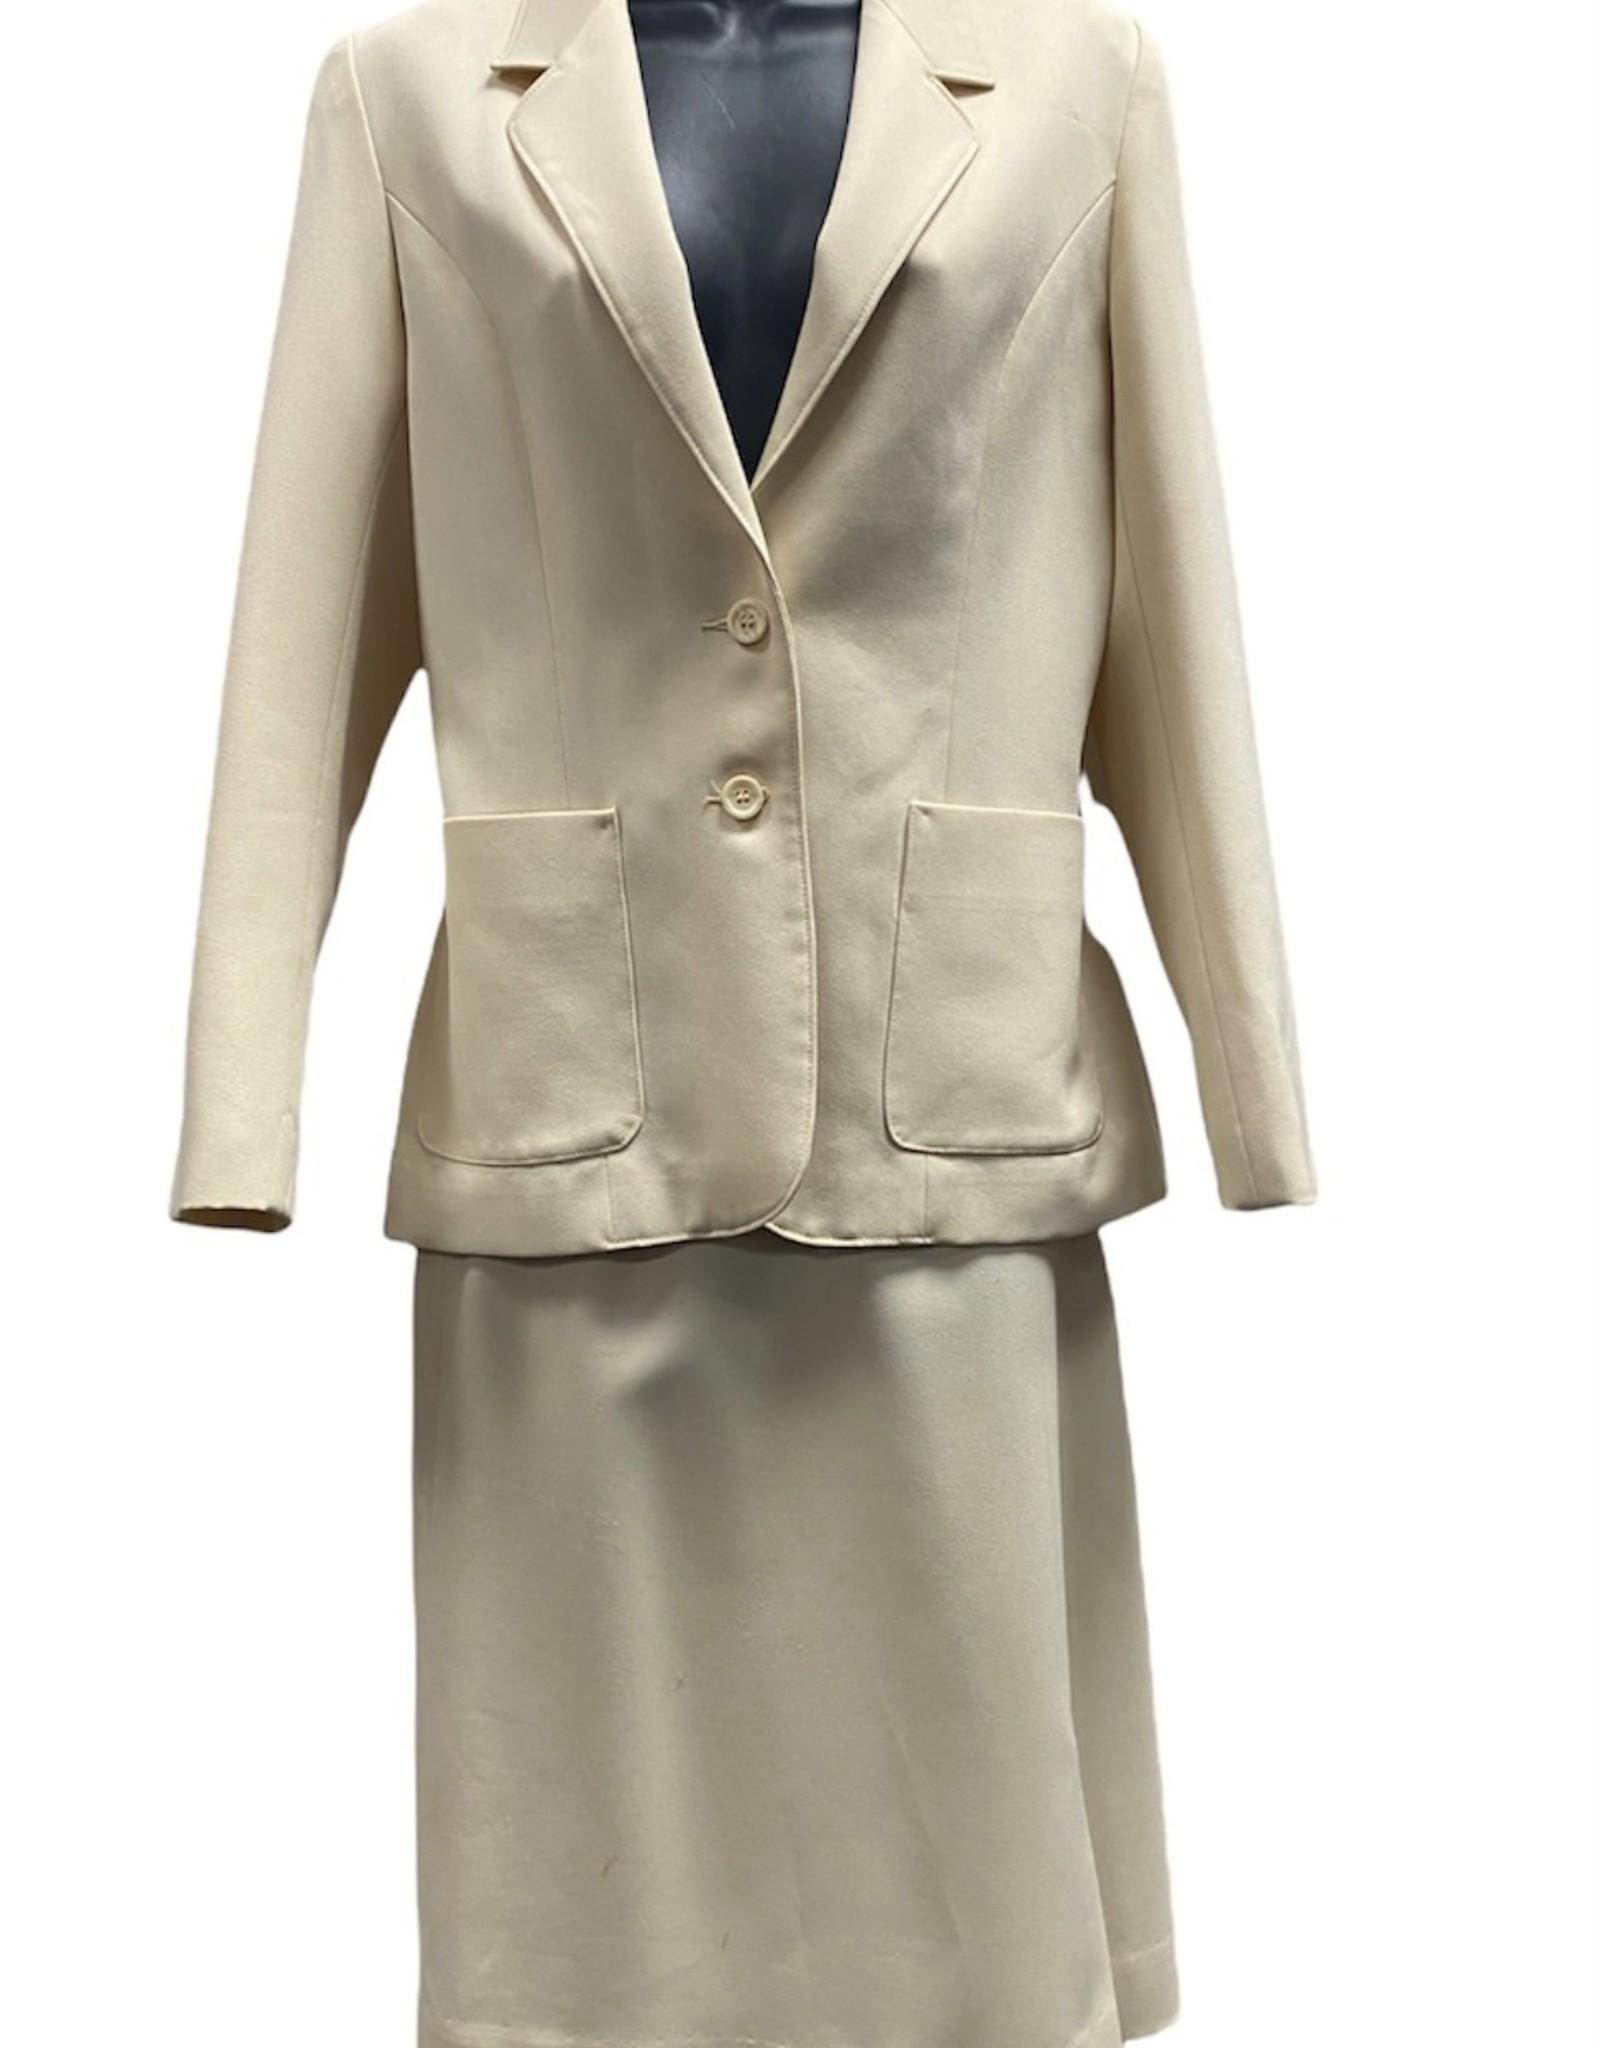 70s cream suit sz 7/8